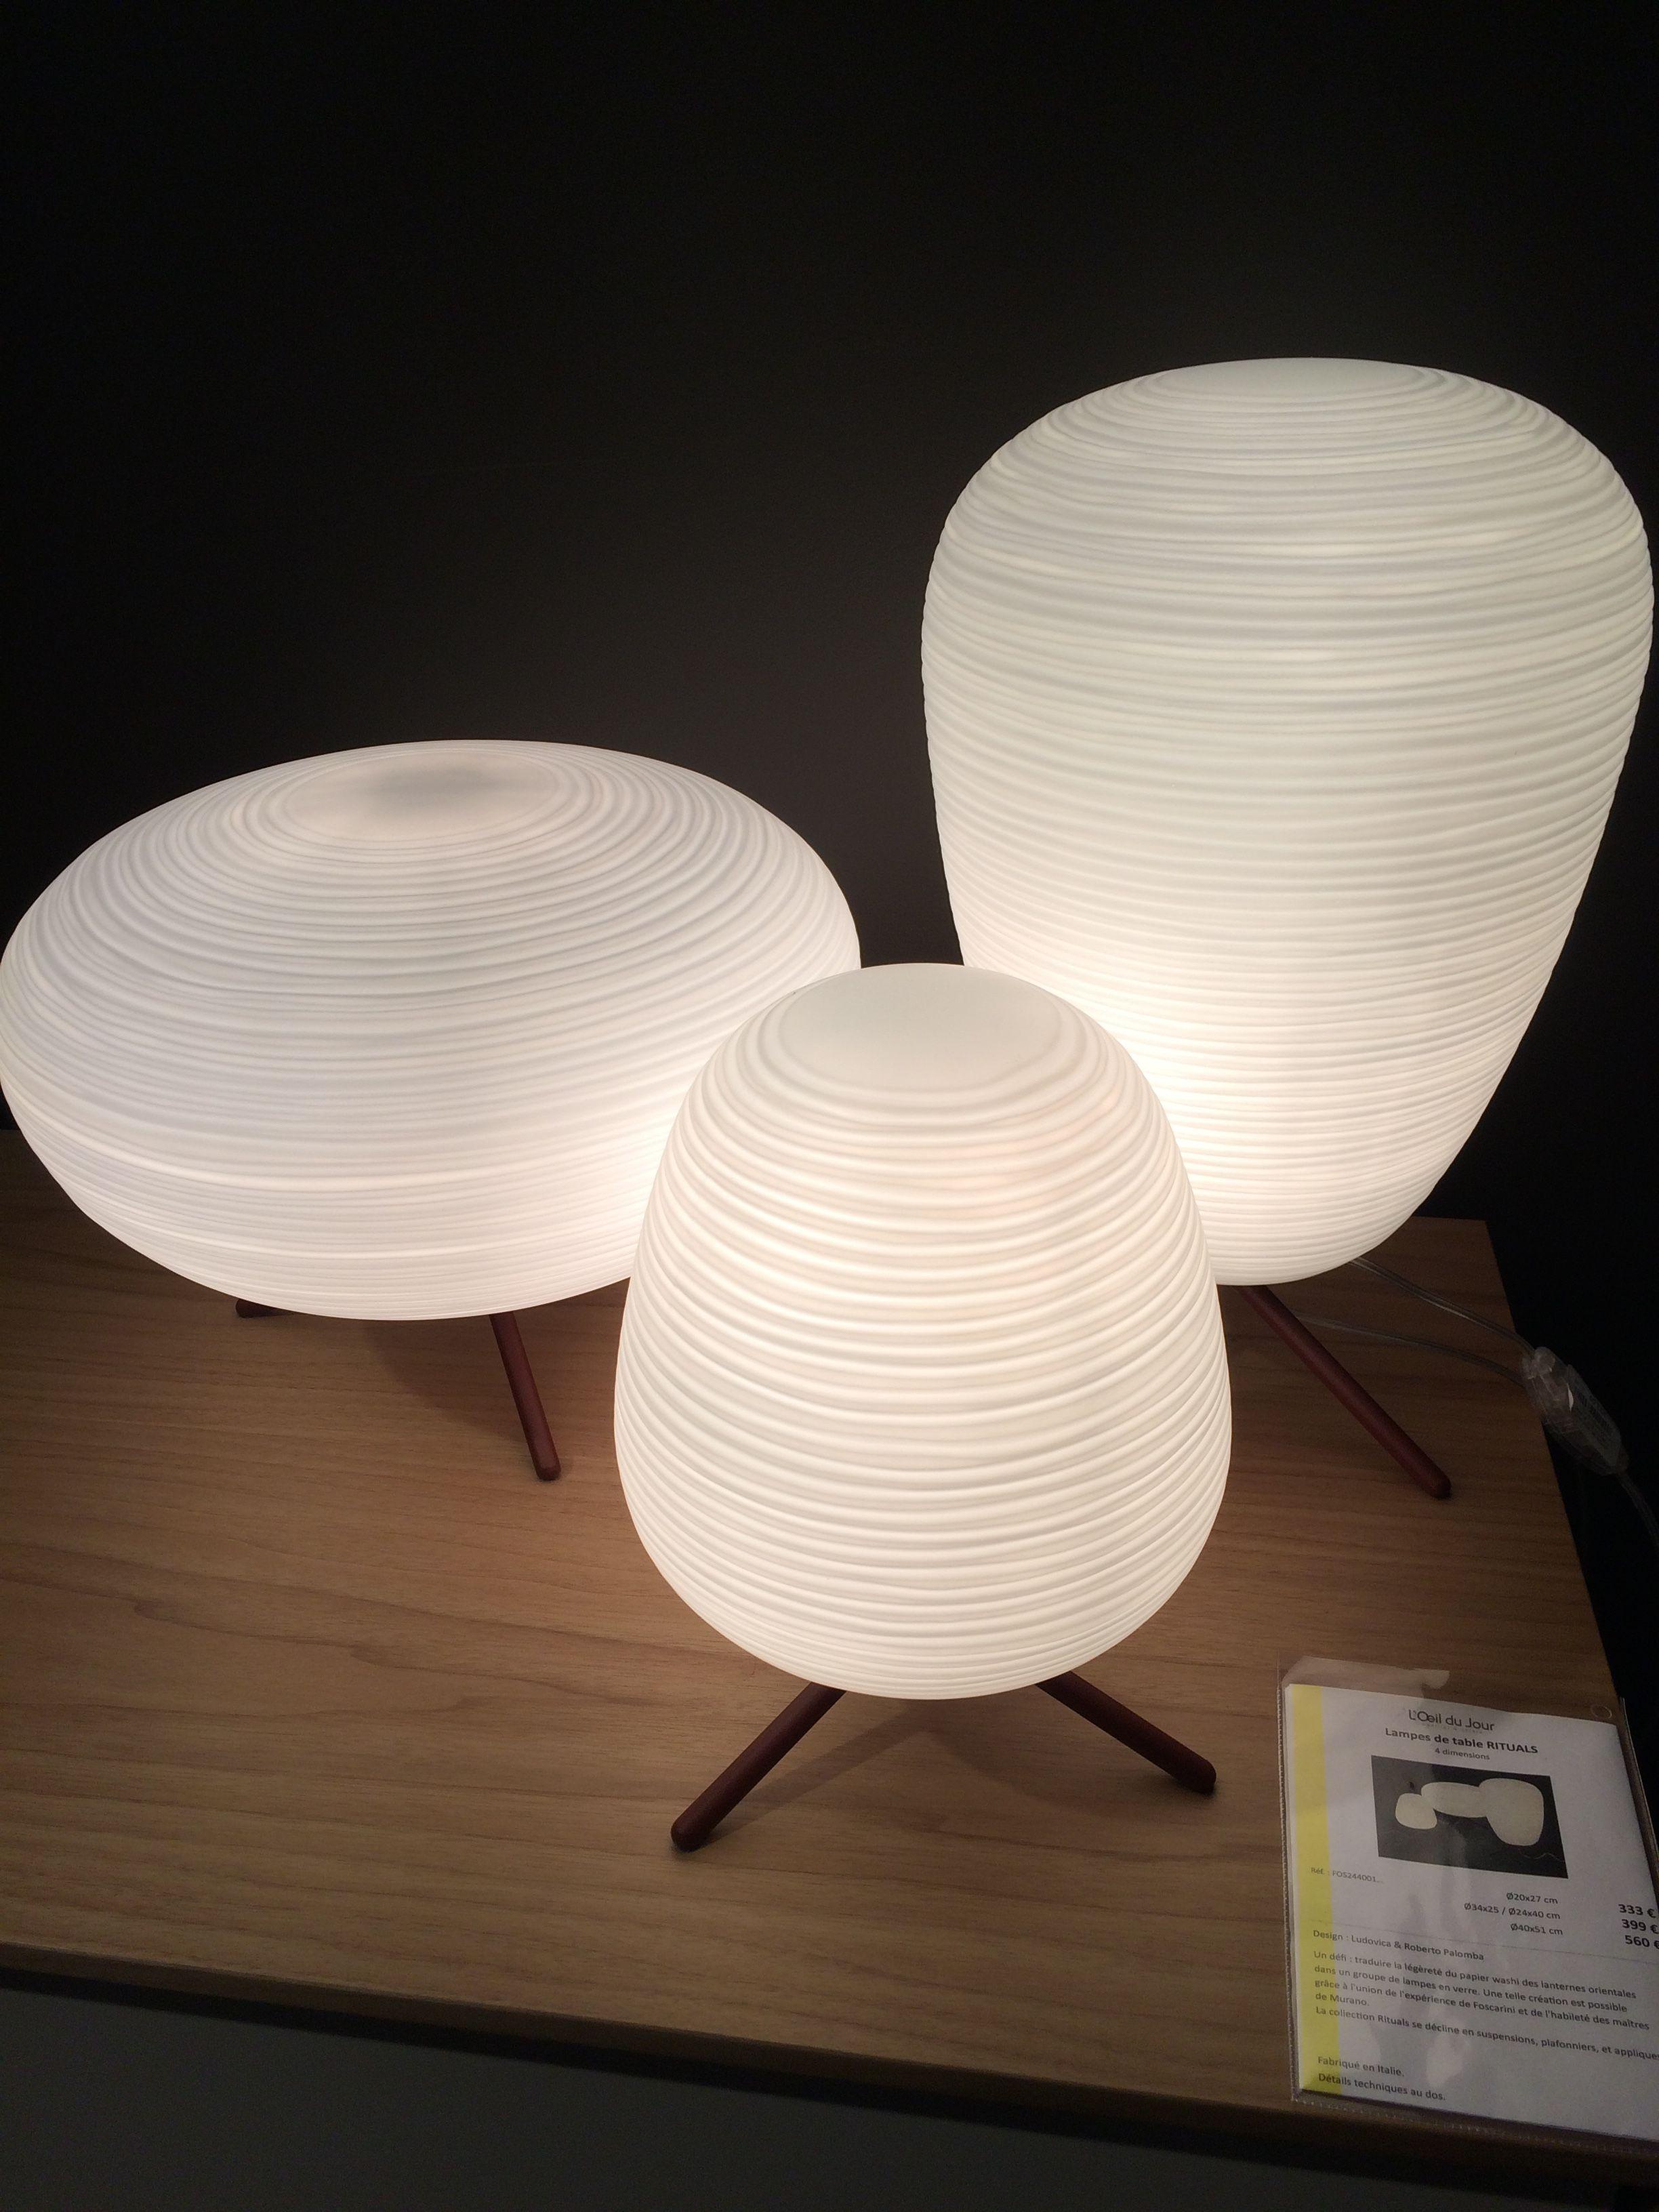 Lampe De Table Rituals De Foscarini En Verre Souffle Satine Et Metal